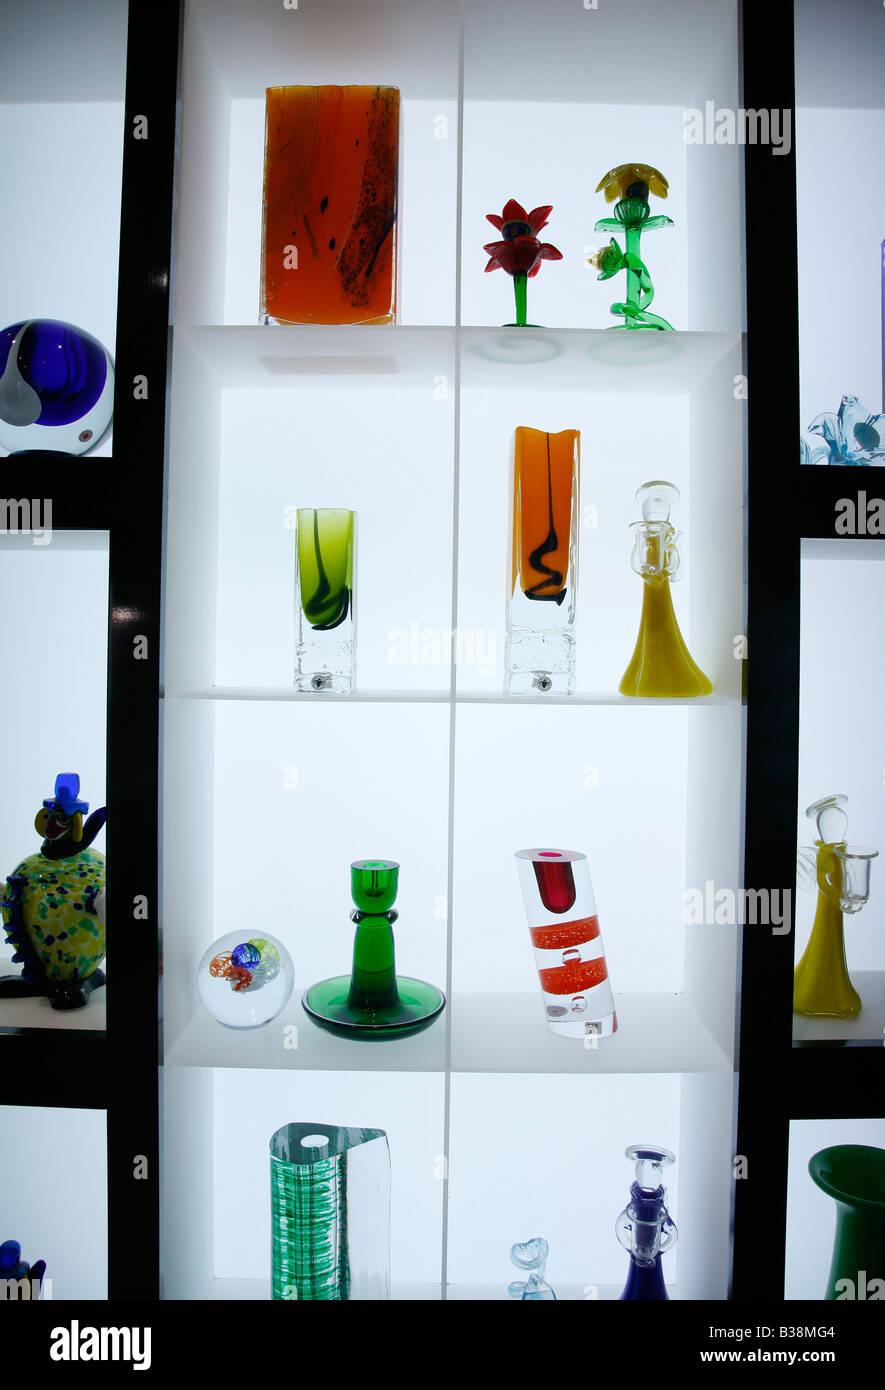 Aug 2008 - Bohemian Glass crystal Prague Czech Republic - Stock Image